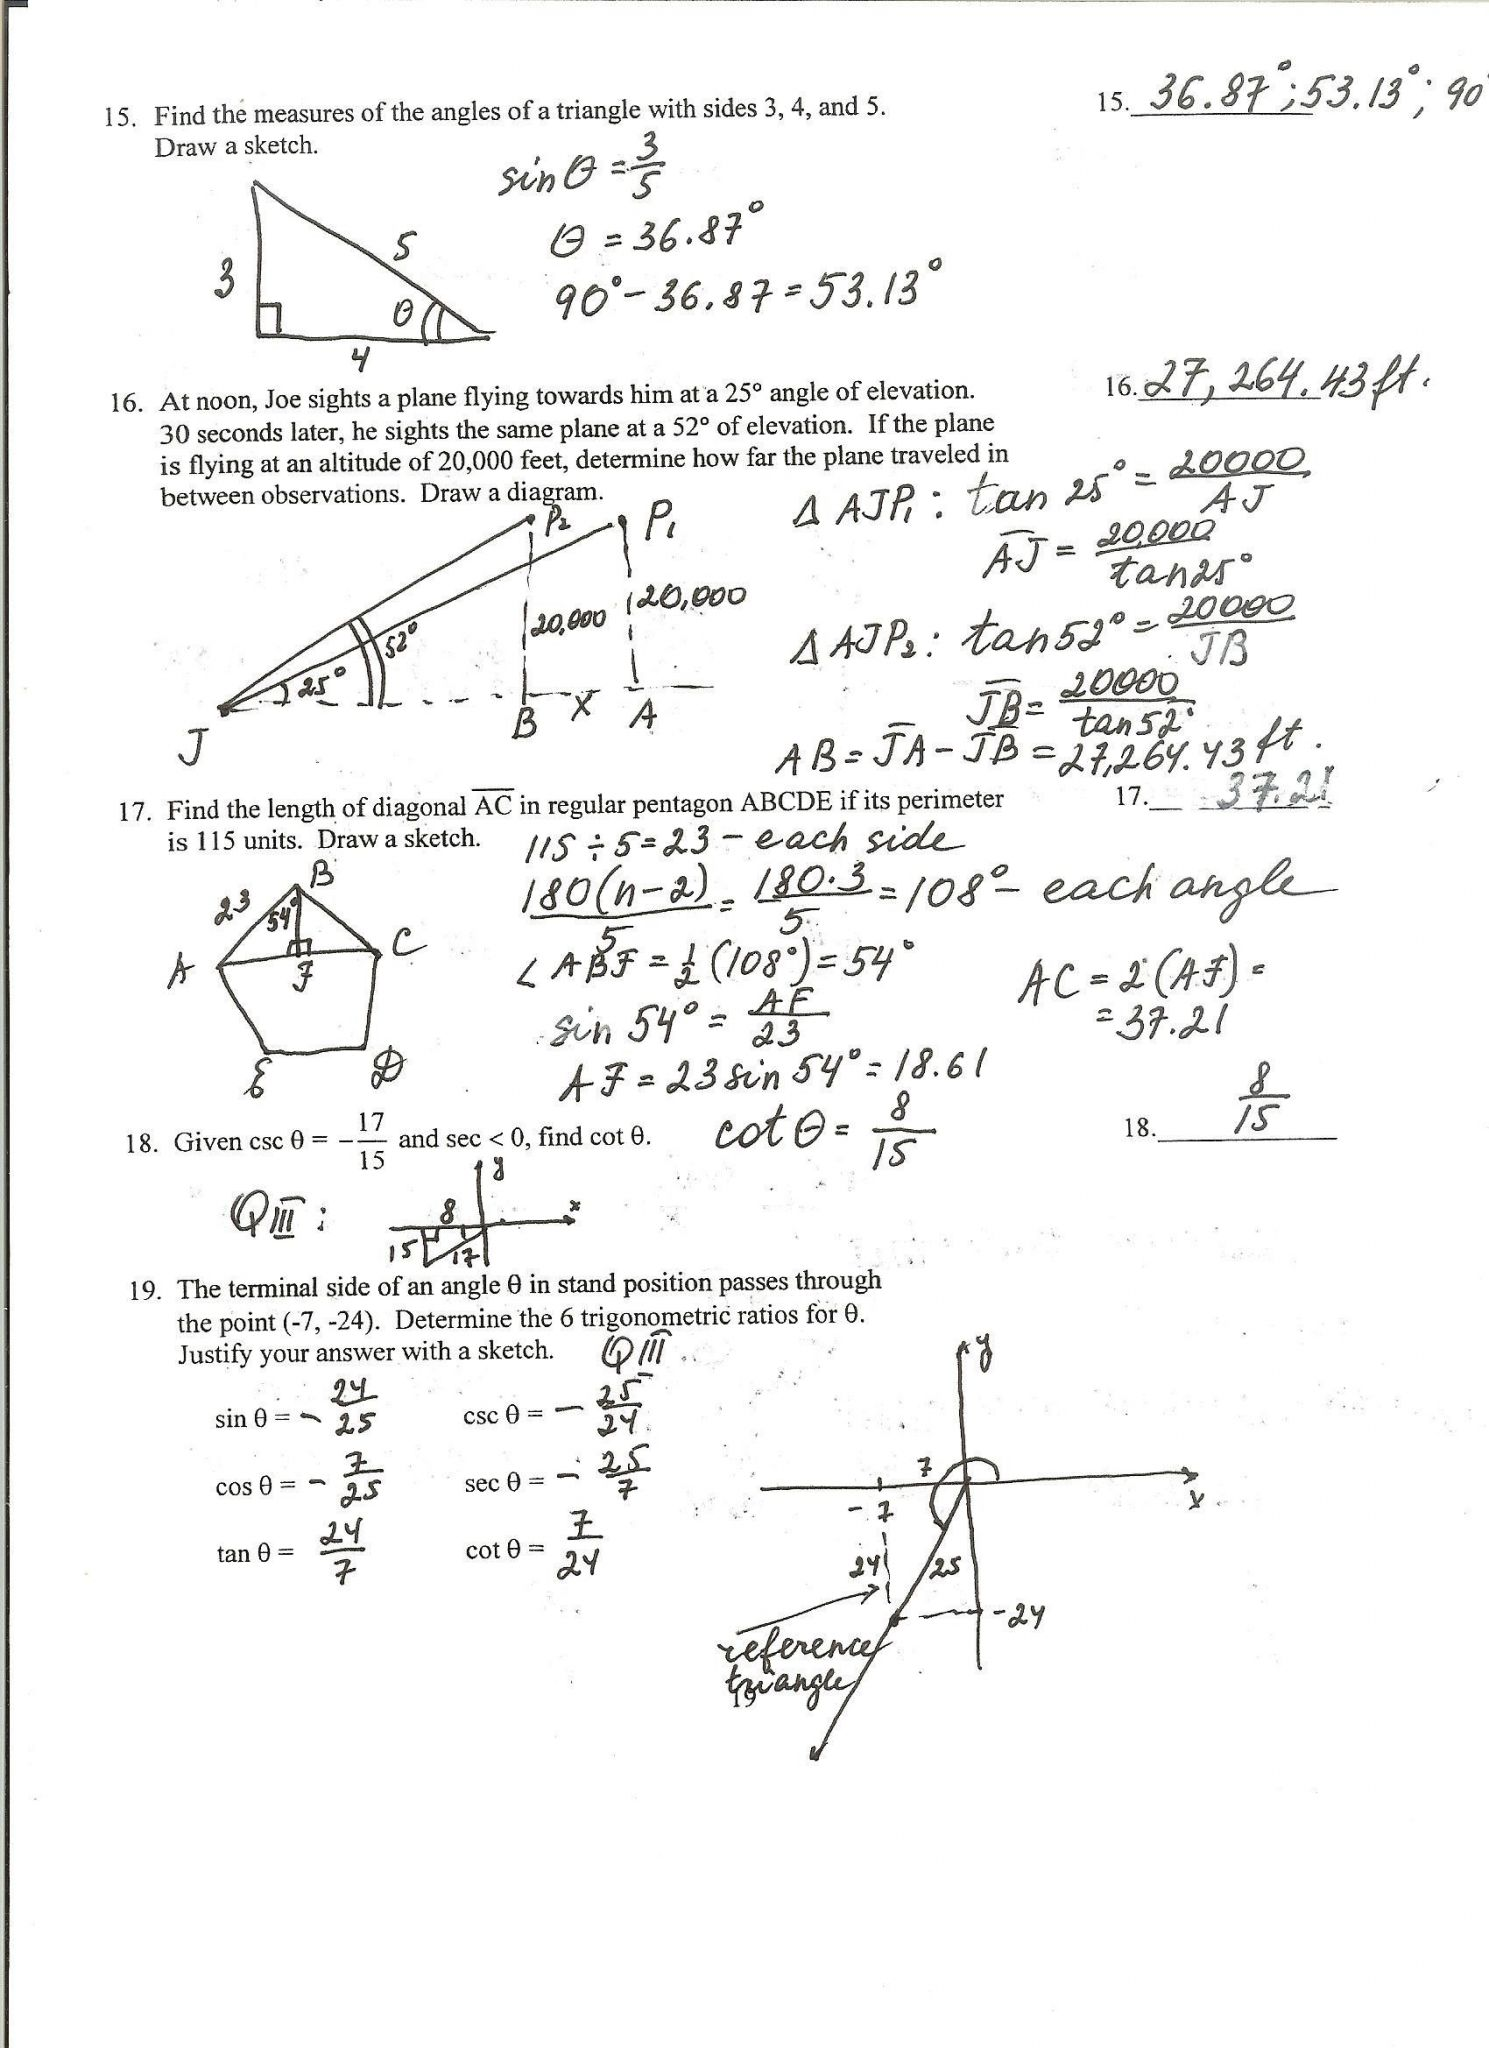 Verifying Trigonometric Identities Worksheet